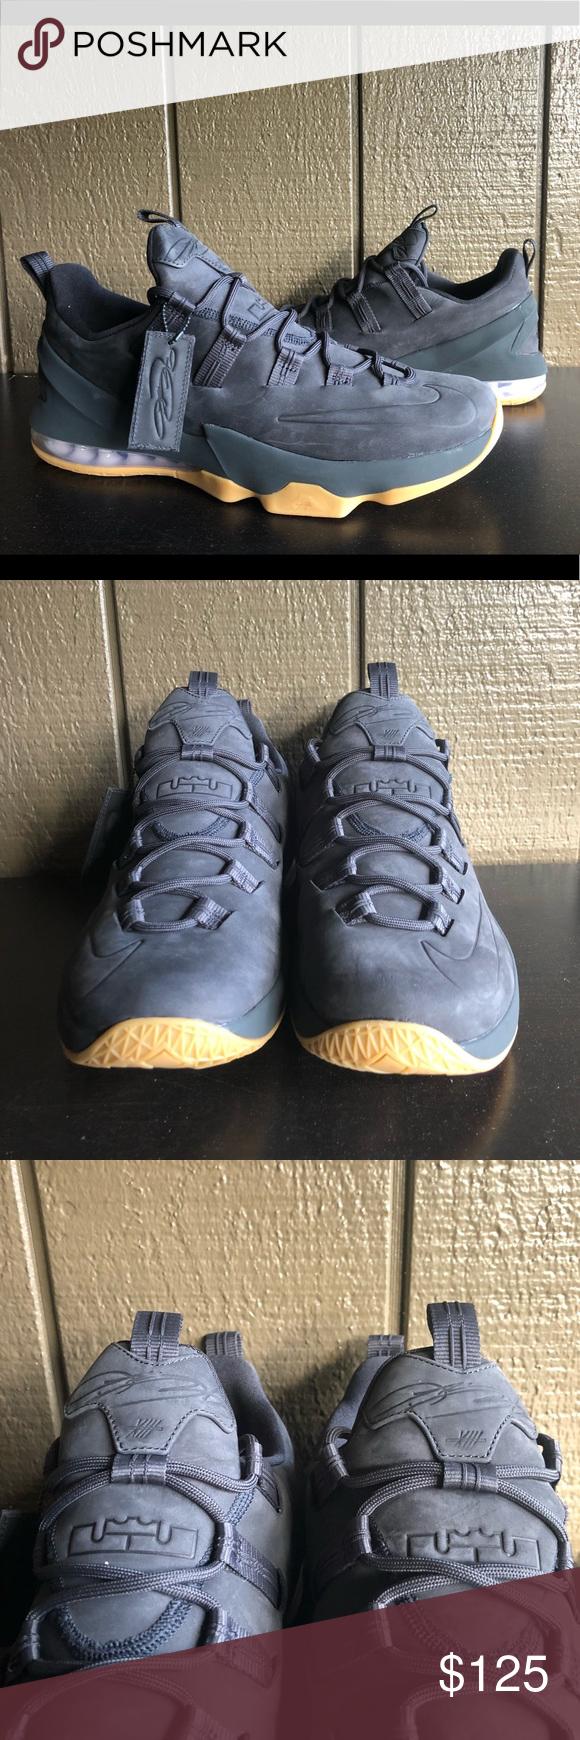 Nike Lebron Xiii Low Prm Anthracite Men S Sz 13 Nike Lebron Xiii Low Prm Premium 13 James Anthracite Men S Ah8289 001 Sz 13 Sneakers Sneaker Head Nike Lebron